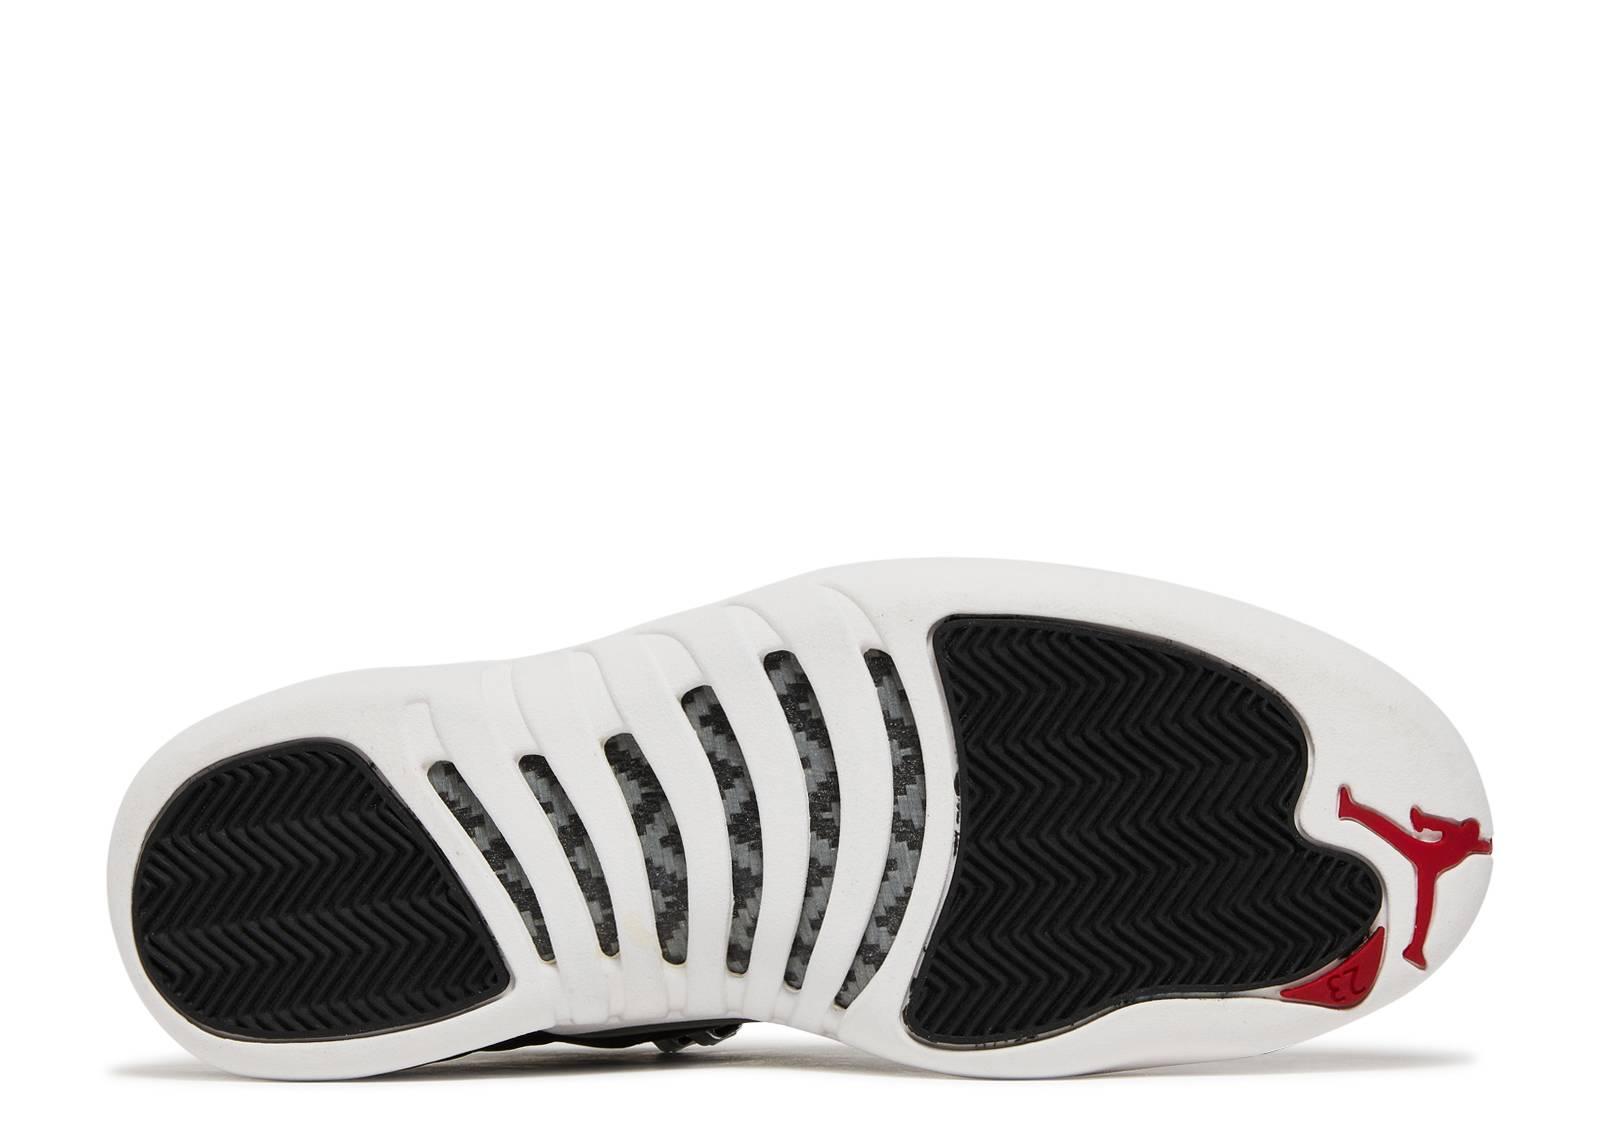 finest selection 6e73a 0c0d8 Air Jordan 12 Retro